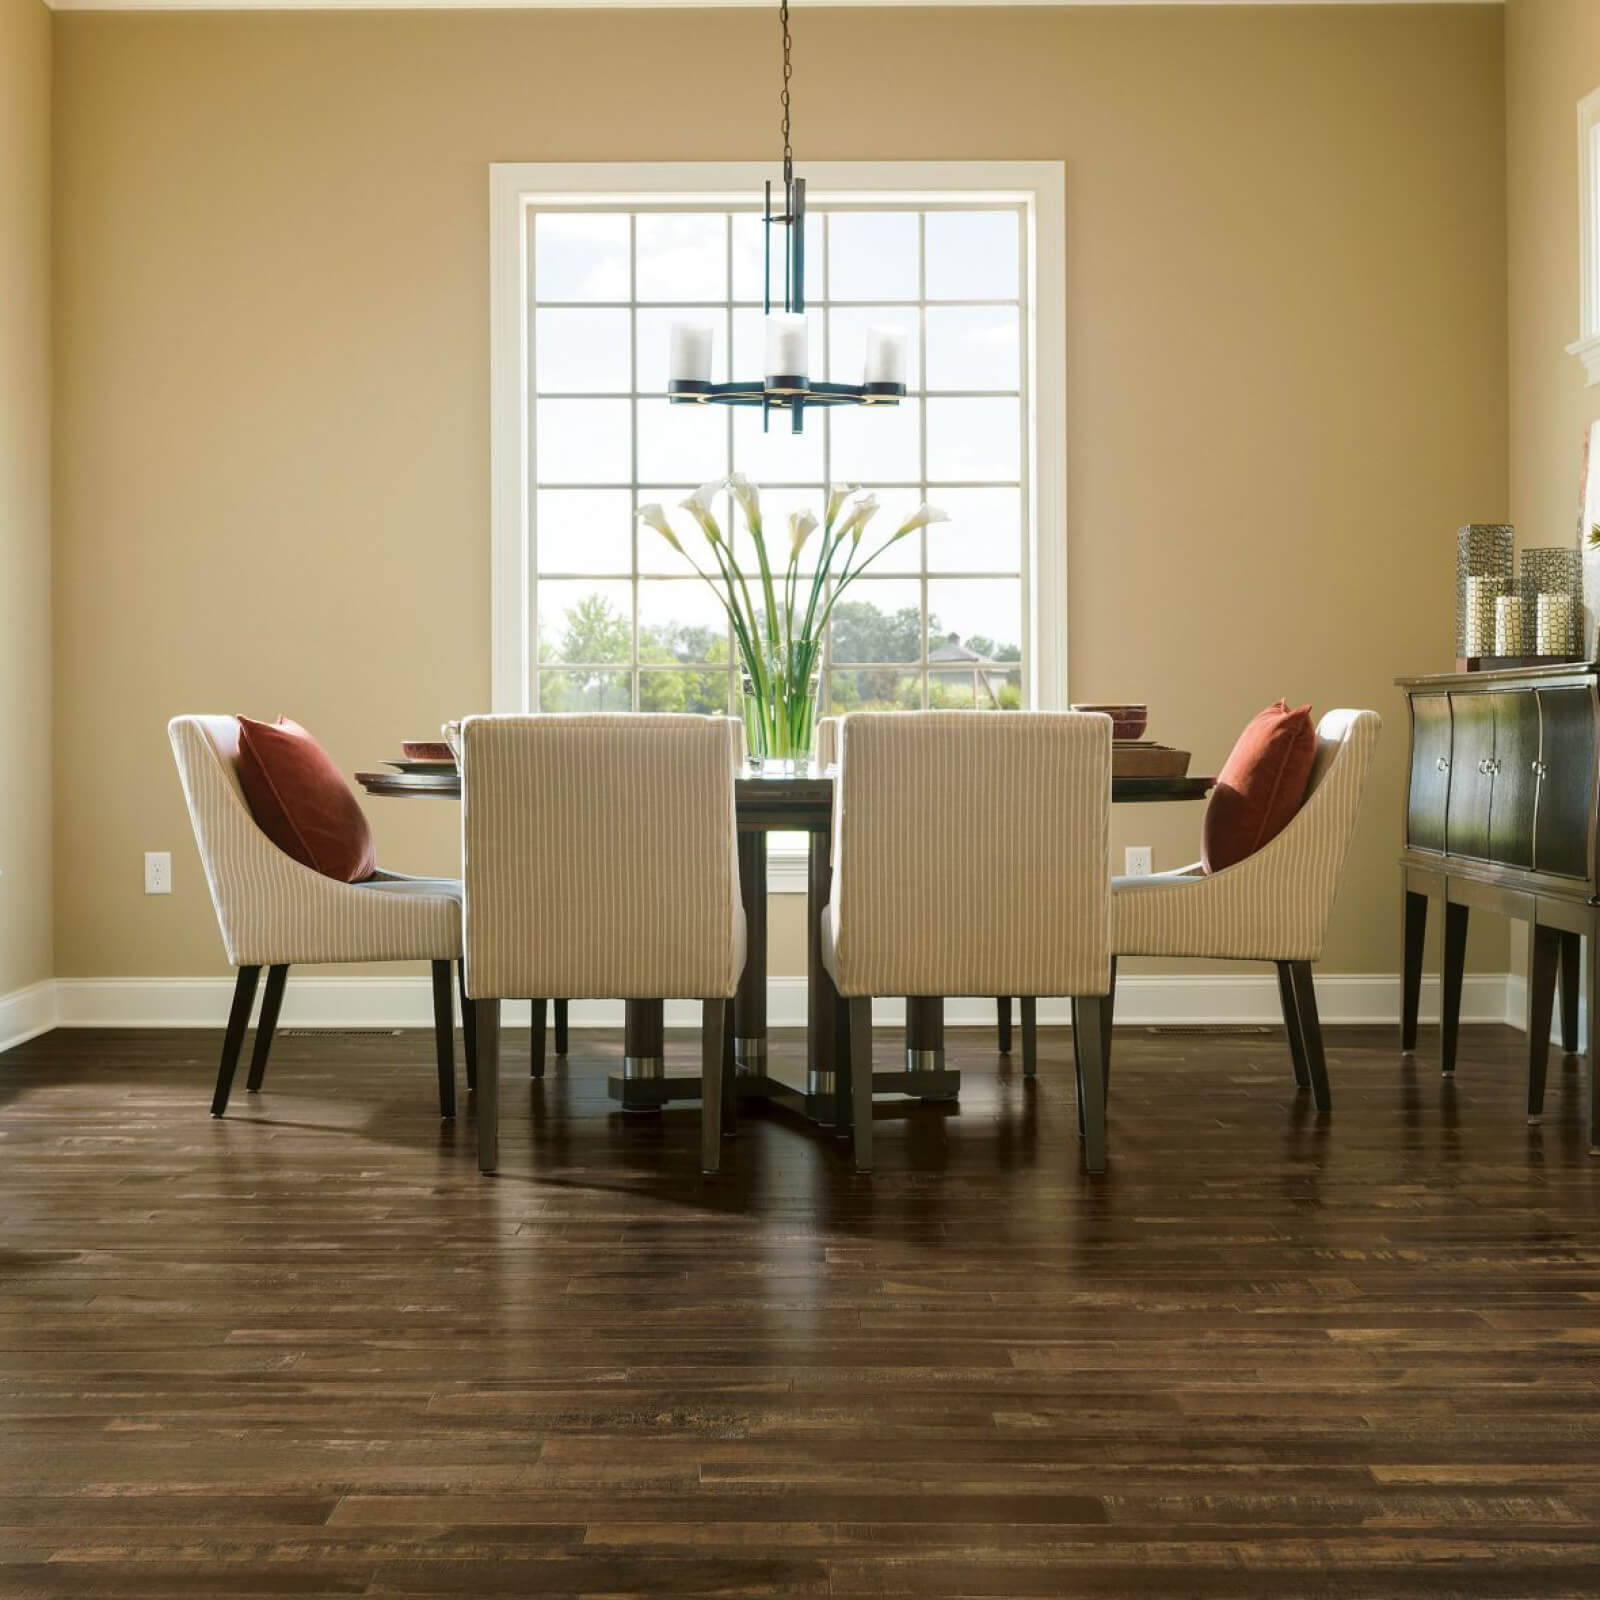 Dining room hardwood flooring | Great Lakes Carpet & Tile